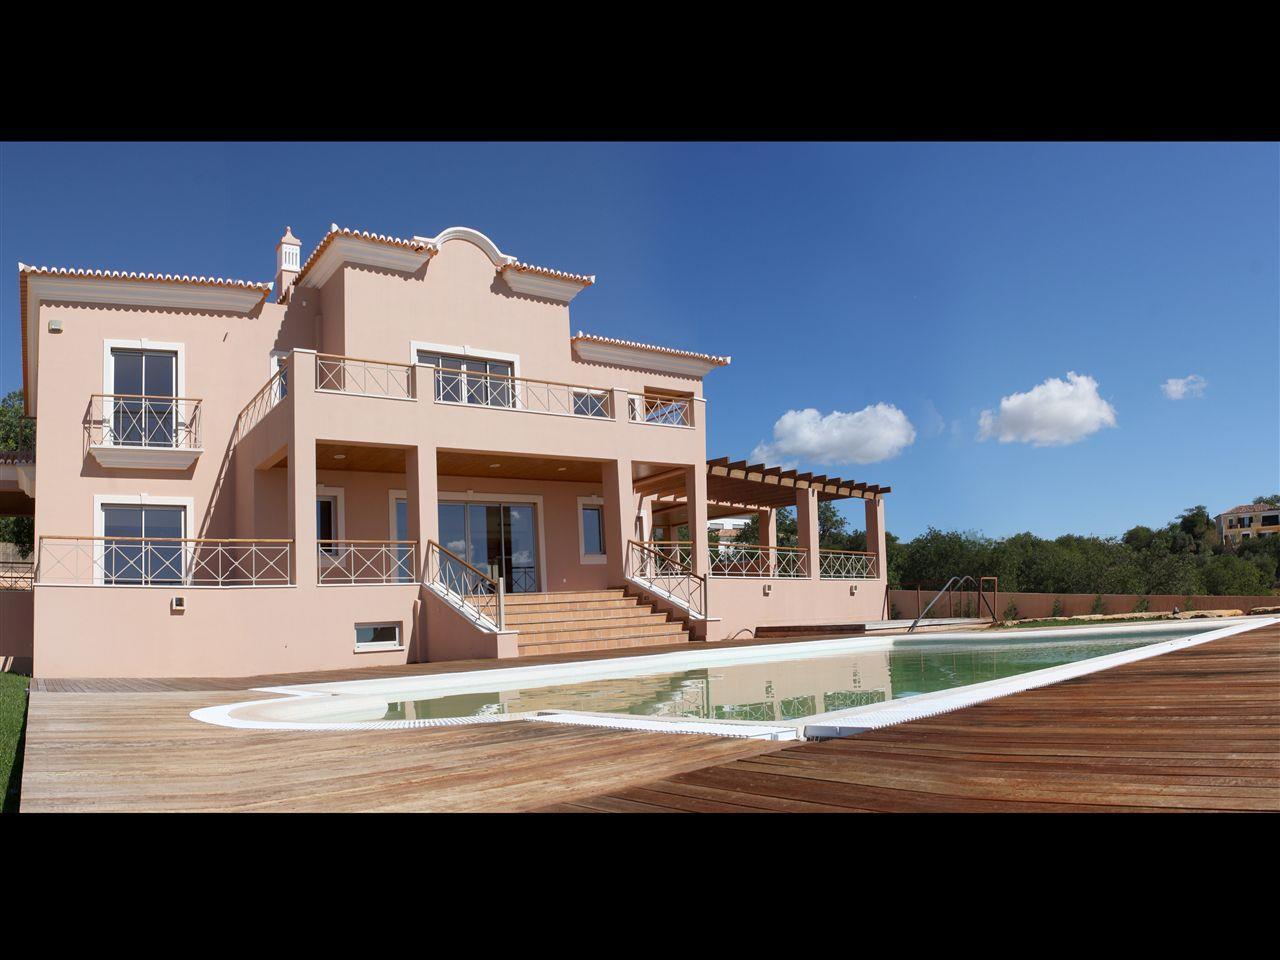 Einfamilienhaus für Verkauf beim House, 5 bedrooms, for Sale Loule, Algarve Portugal